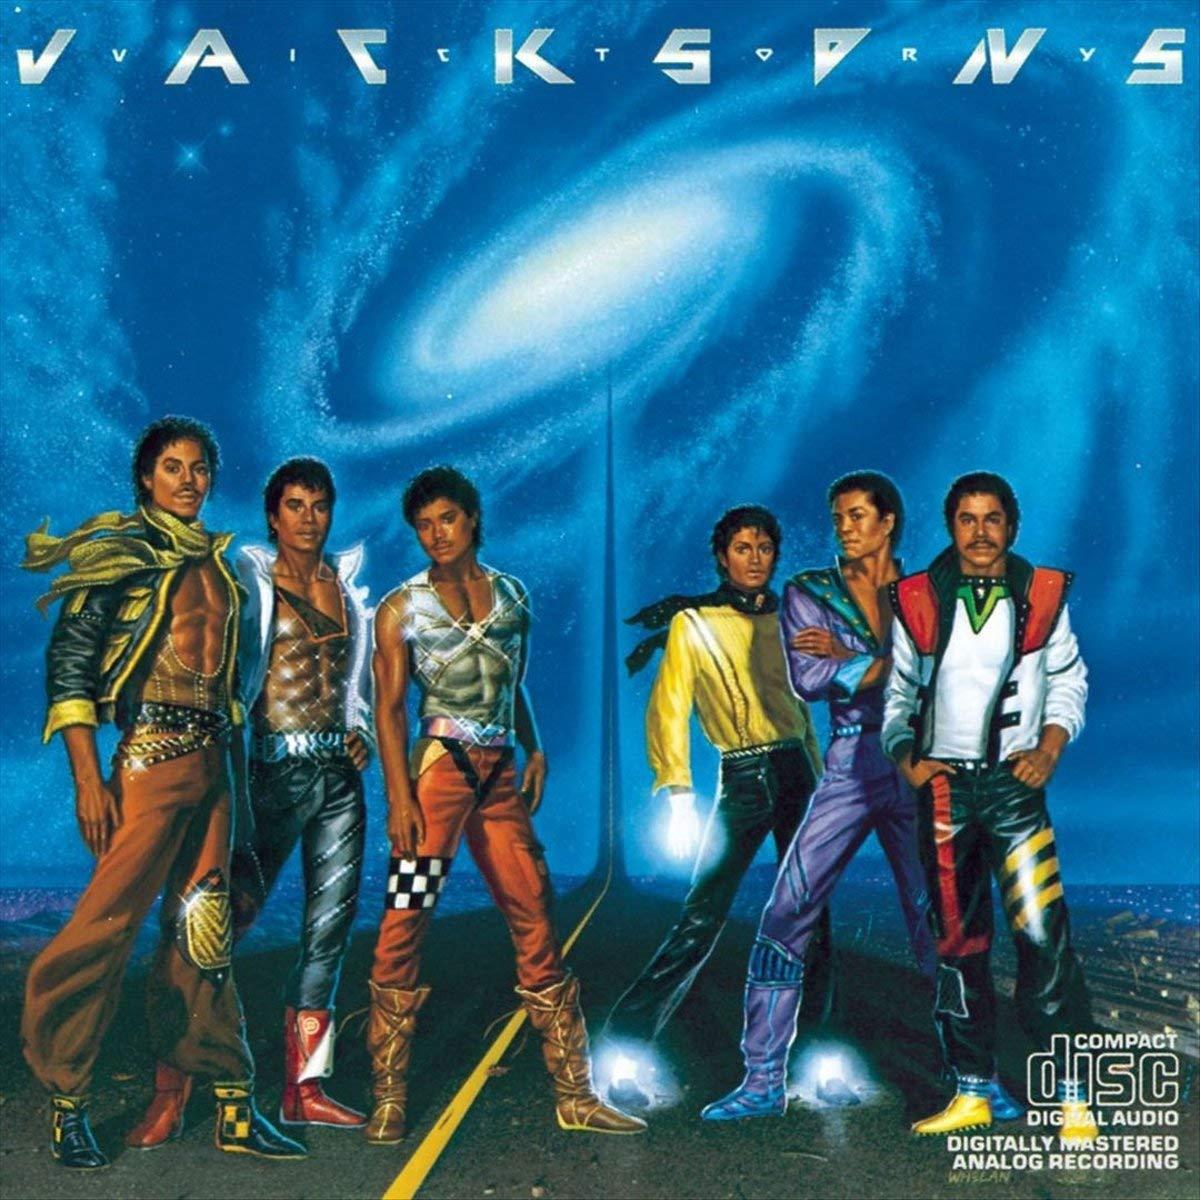 Jacksons 5 - Victory CD